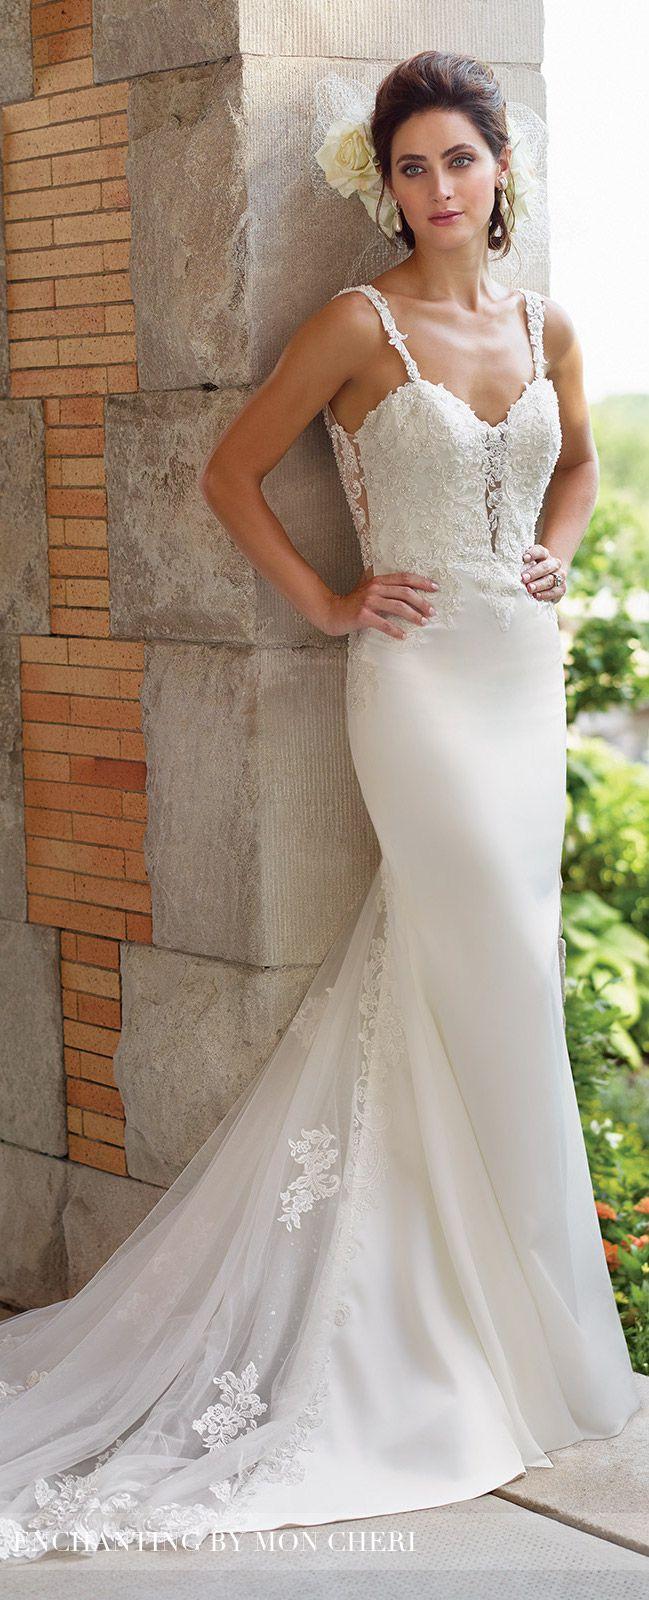 Plunging Neckline Wedding Dress -Enchanting by Mon Cheri Spring 2017